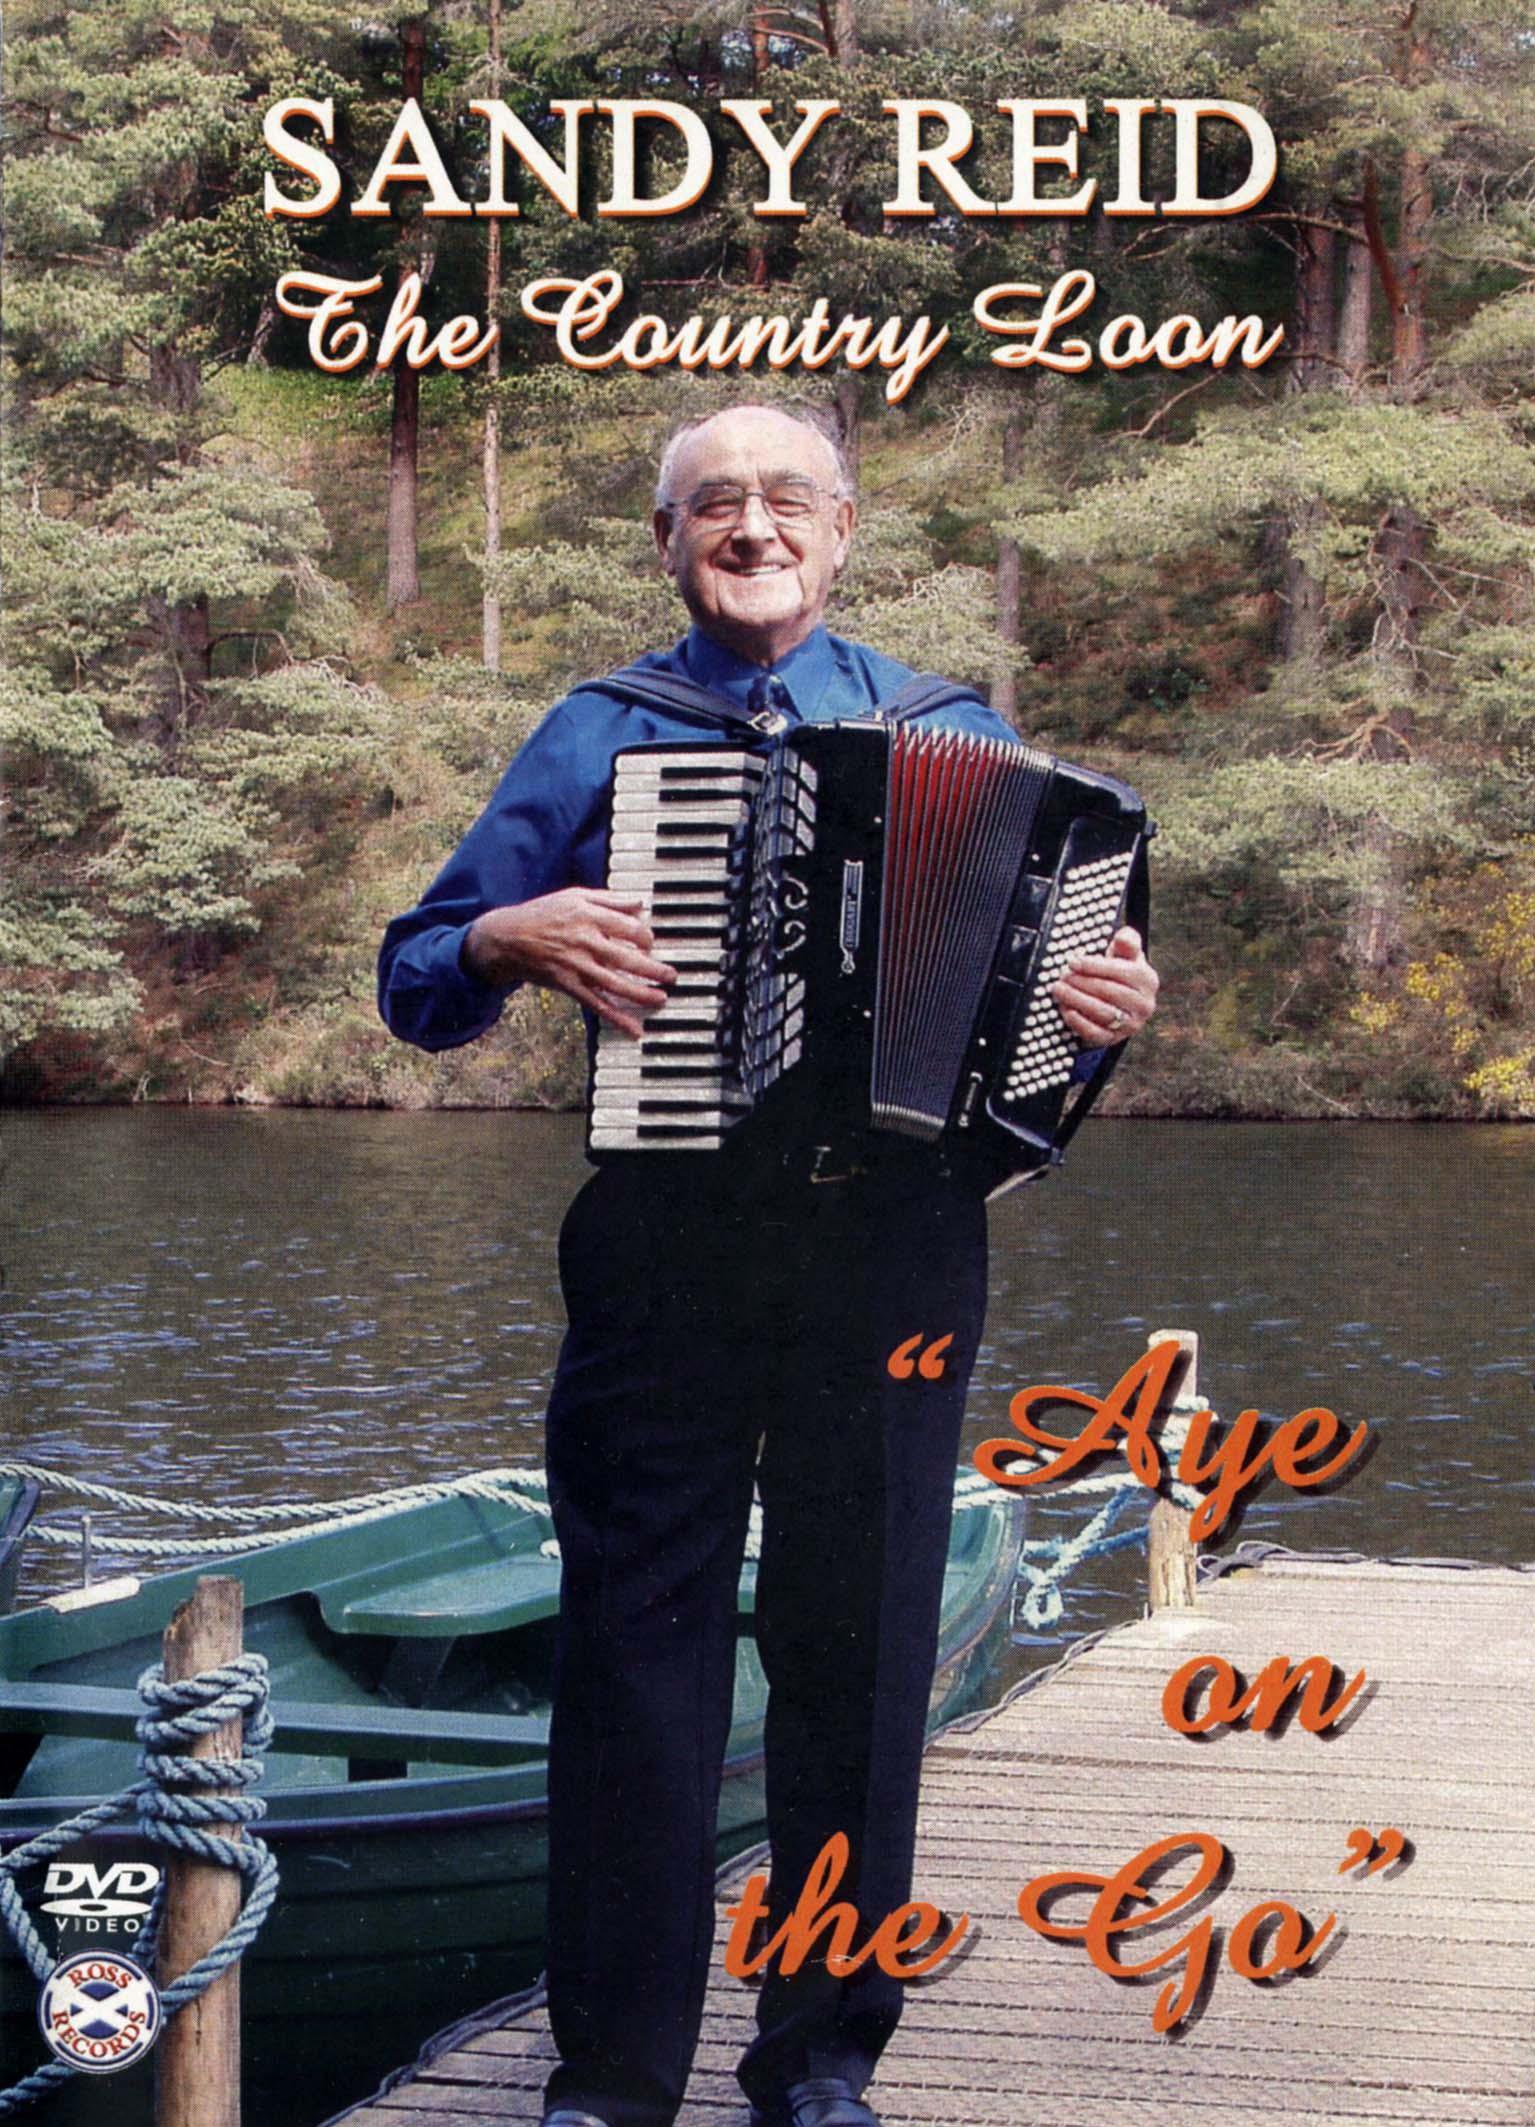 Sandy Reid the Country Loon: